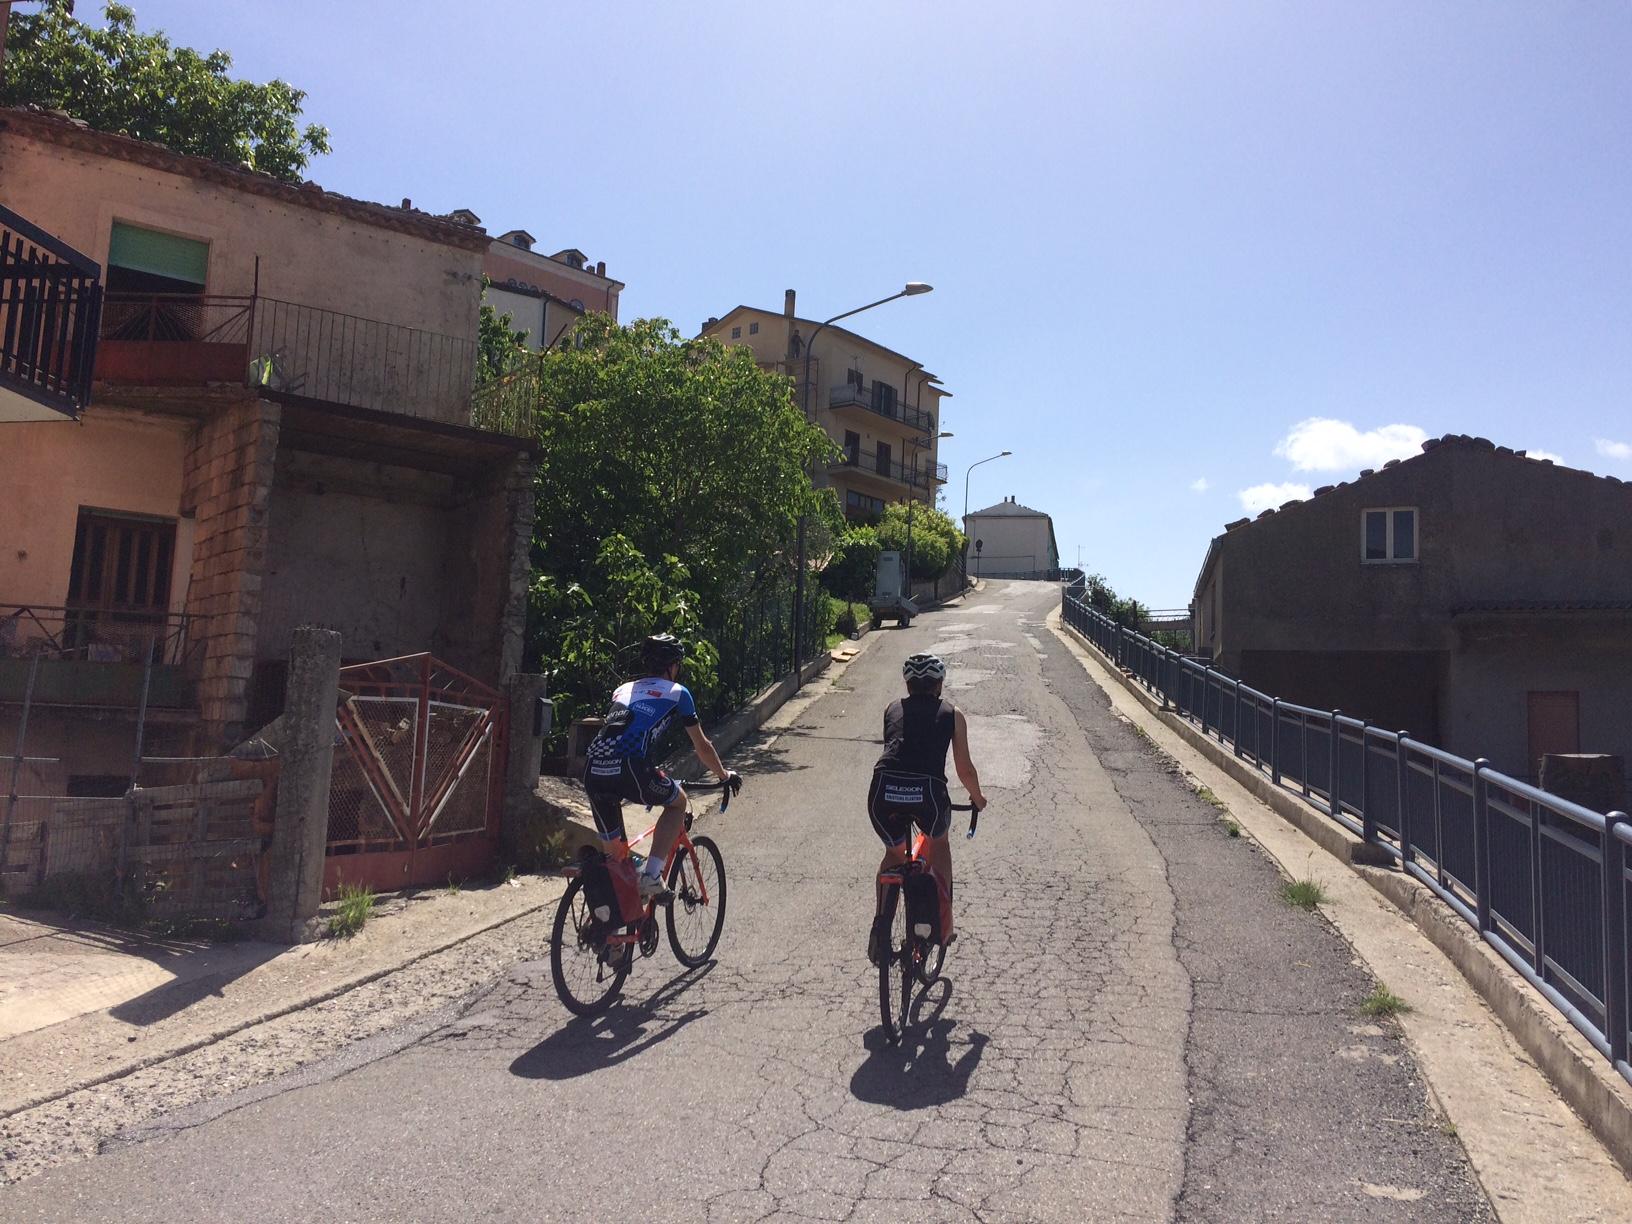 Jan and Veerle cycling in Terranova del Pollino